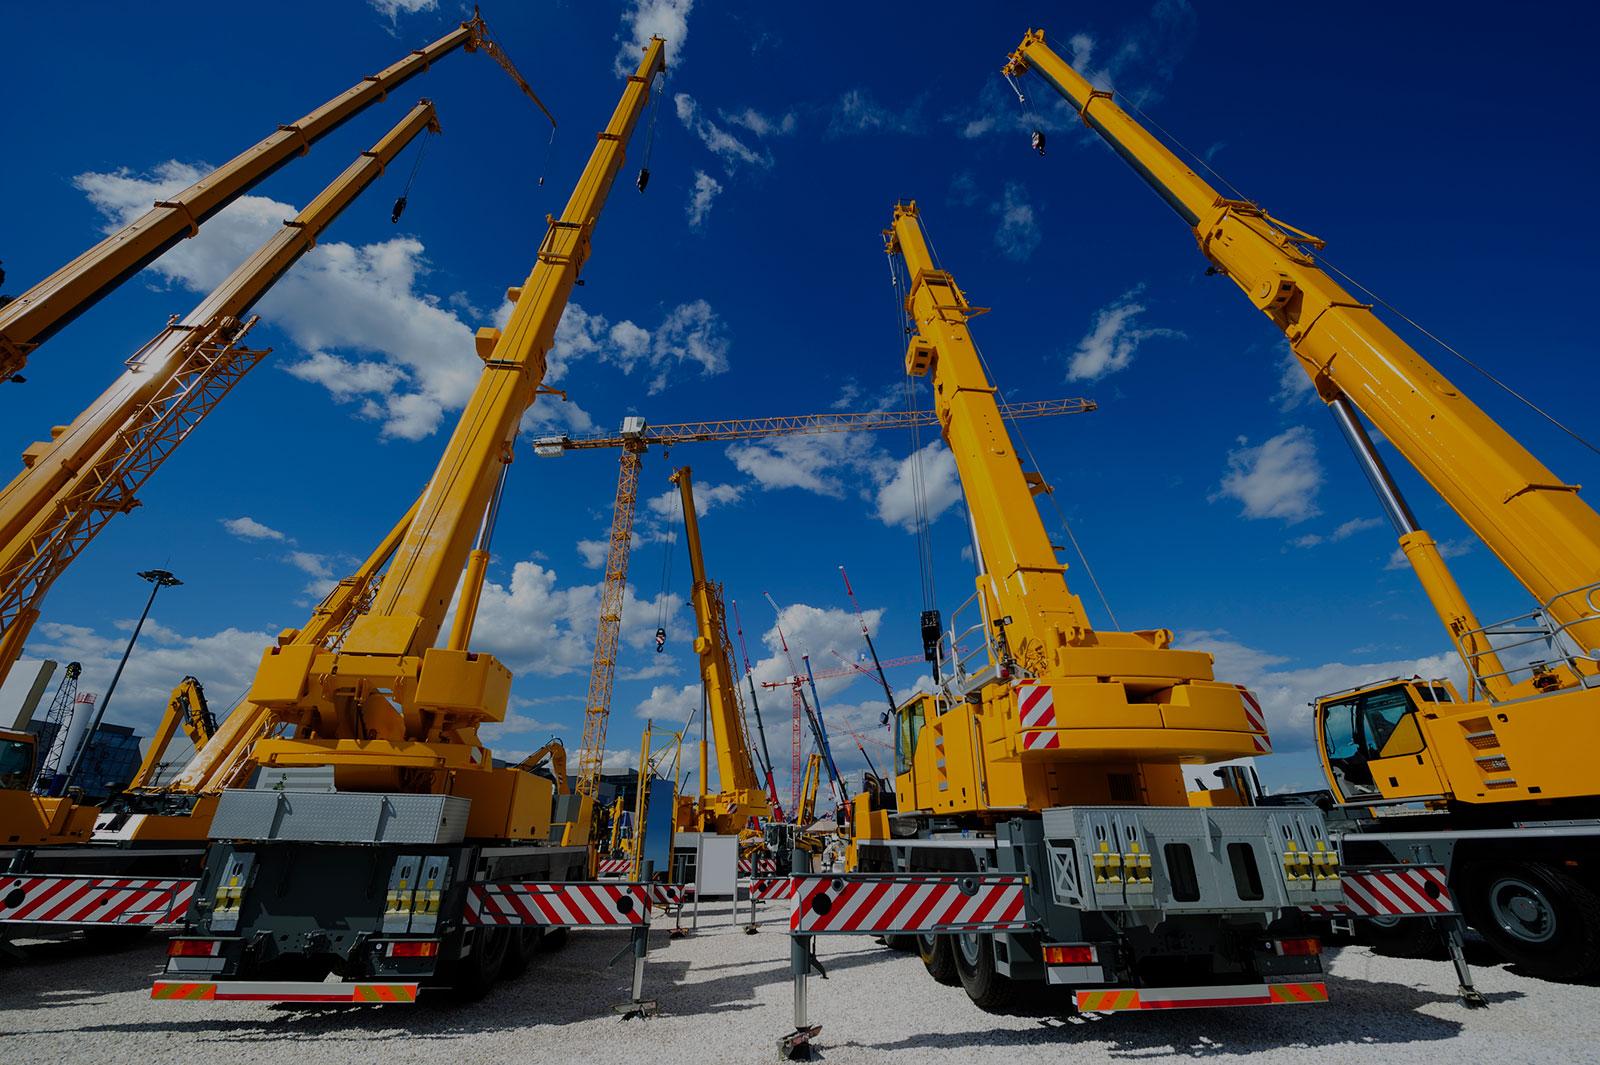 Equipment Leasing & Finance Header Background - Yellow Cranes Underneath Blue Sky